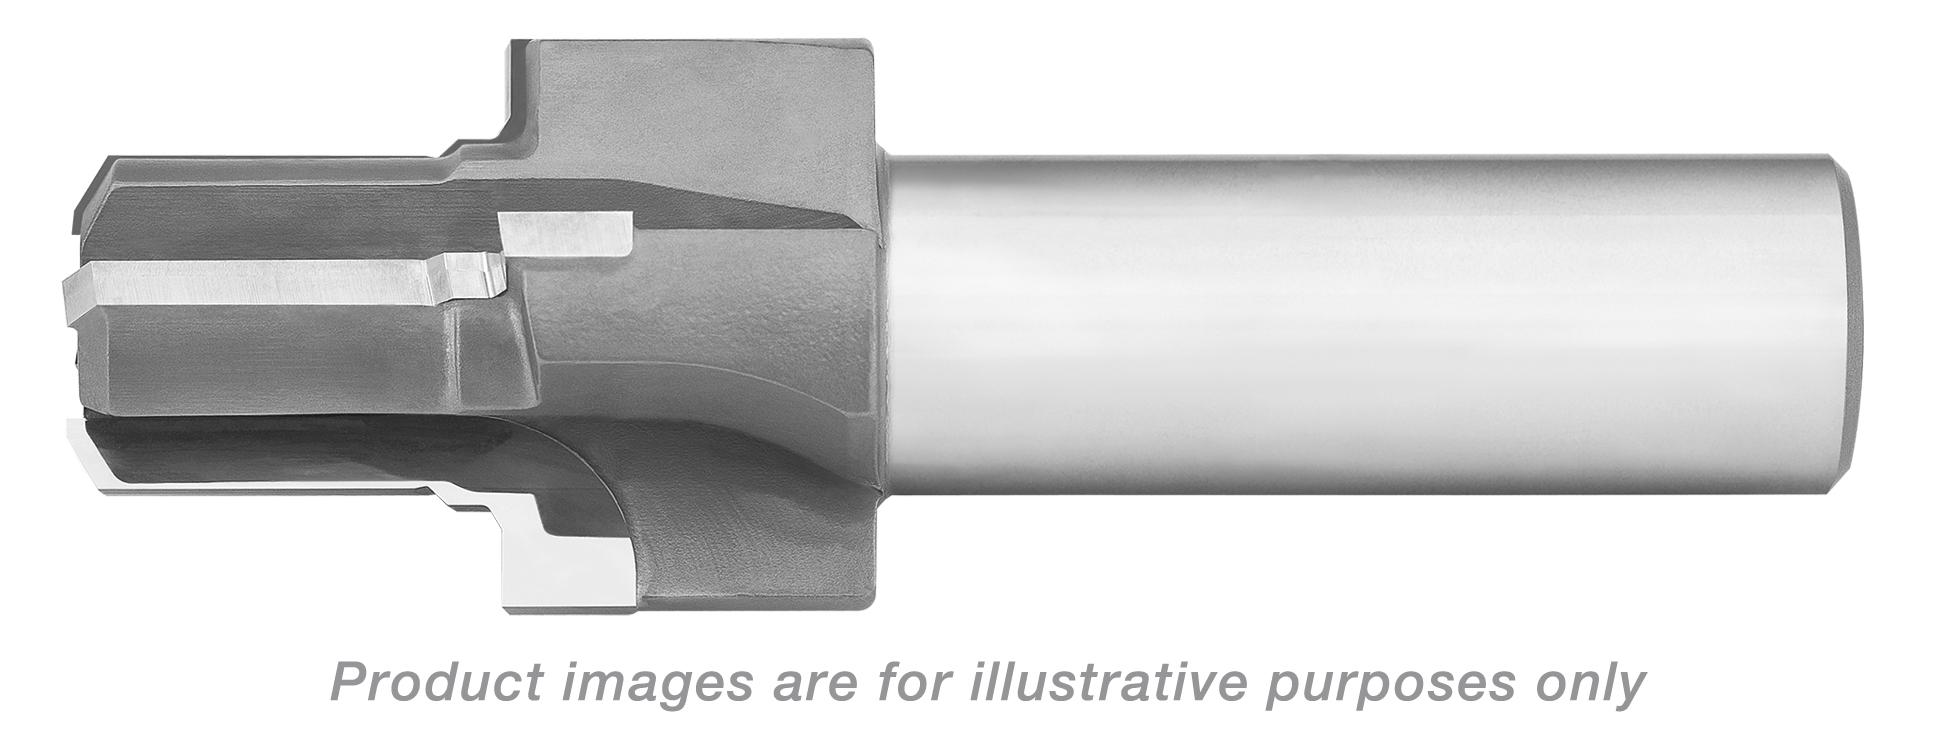 REAMER PILOT PORT TOOL CARBIDE TIPPED 1 1/16-12 THREAD 3/4 TUBE 3.94 OAL